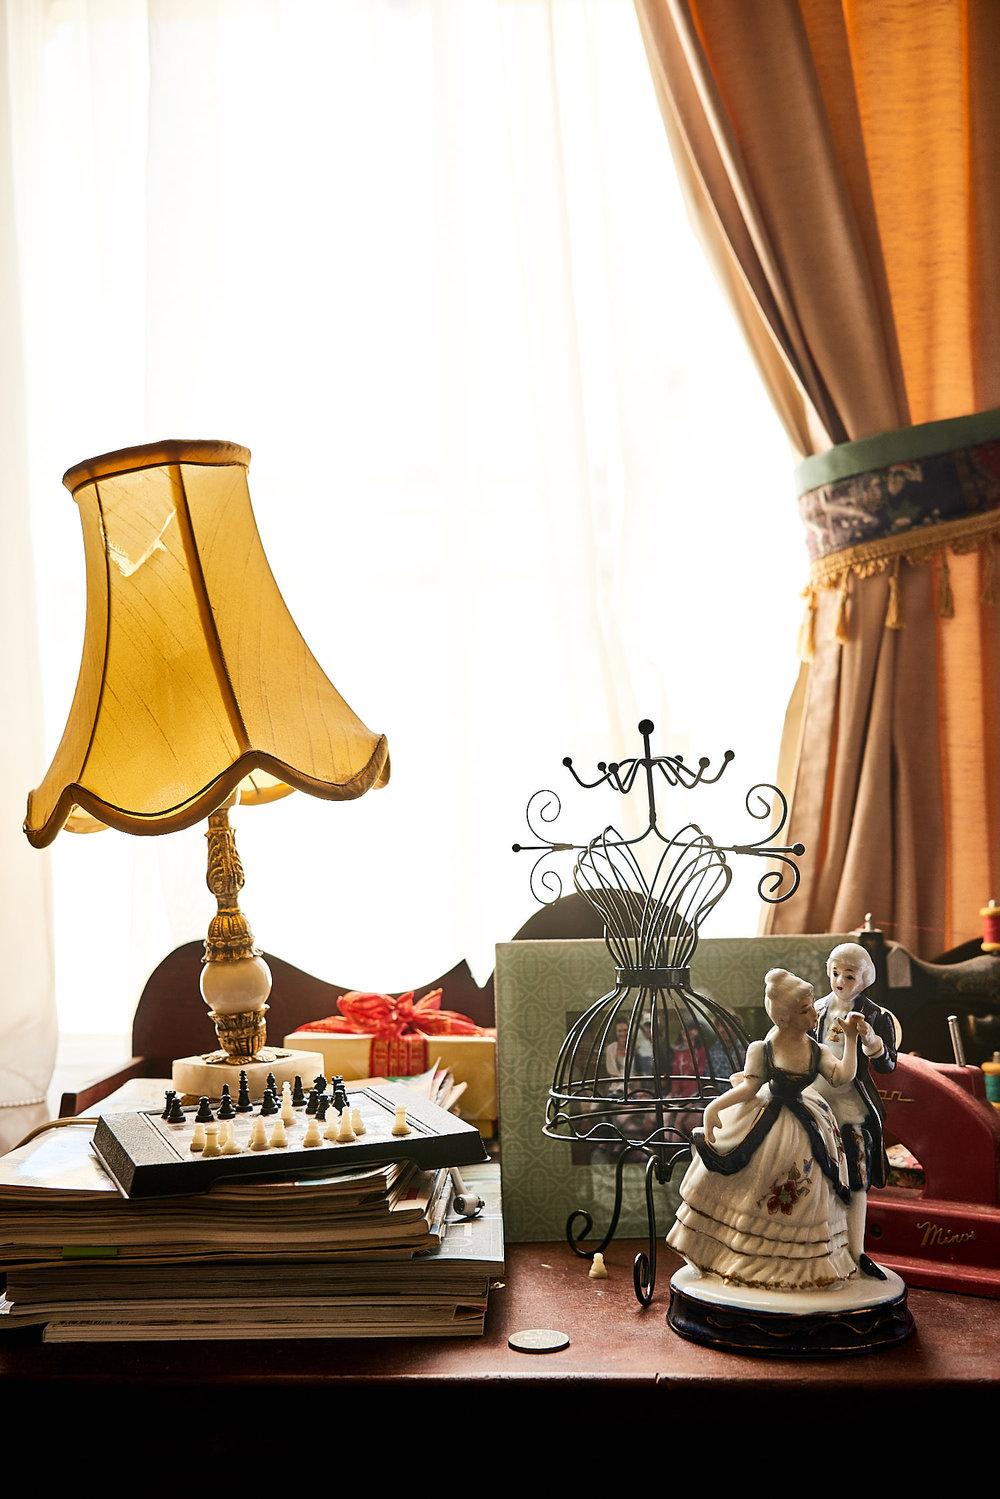 mel-arnott-still-life-room-vignette.jpg